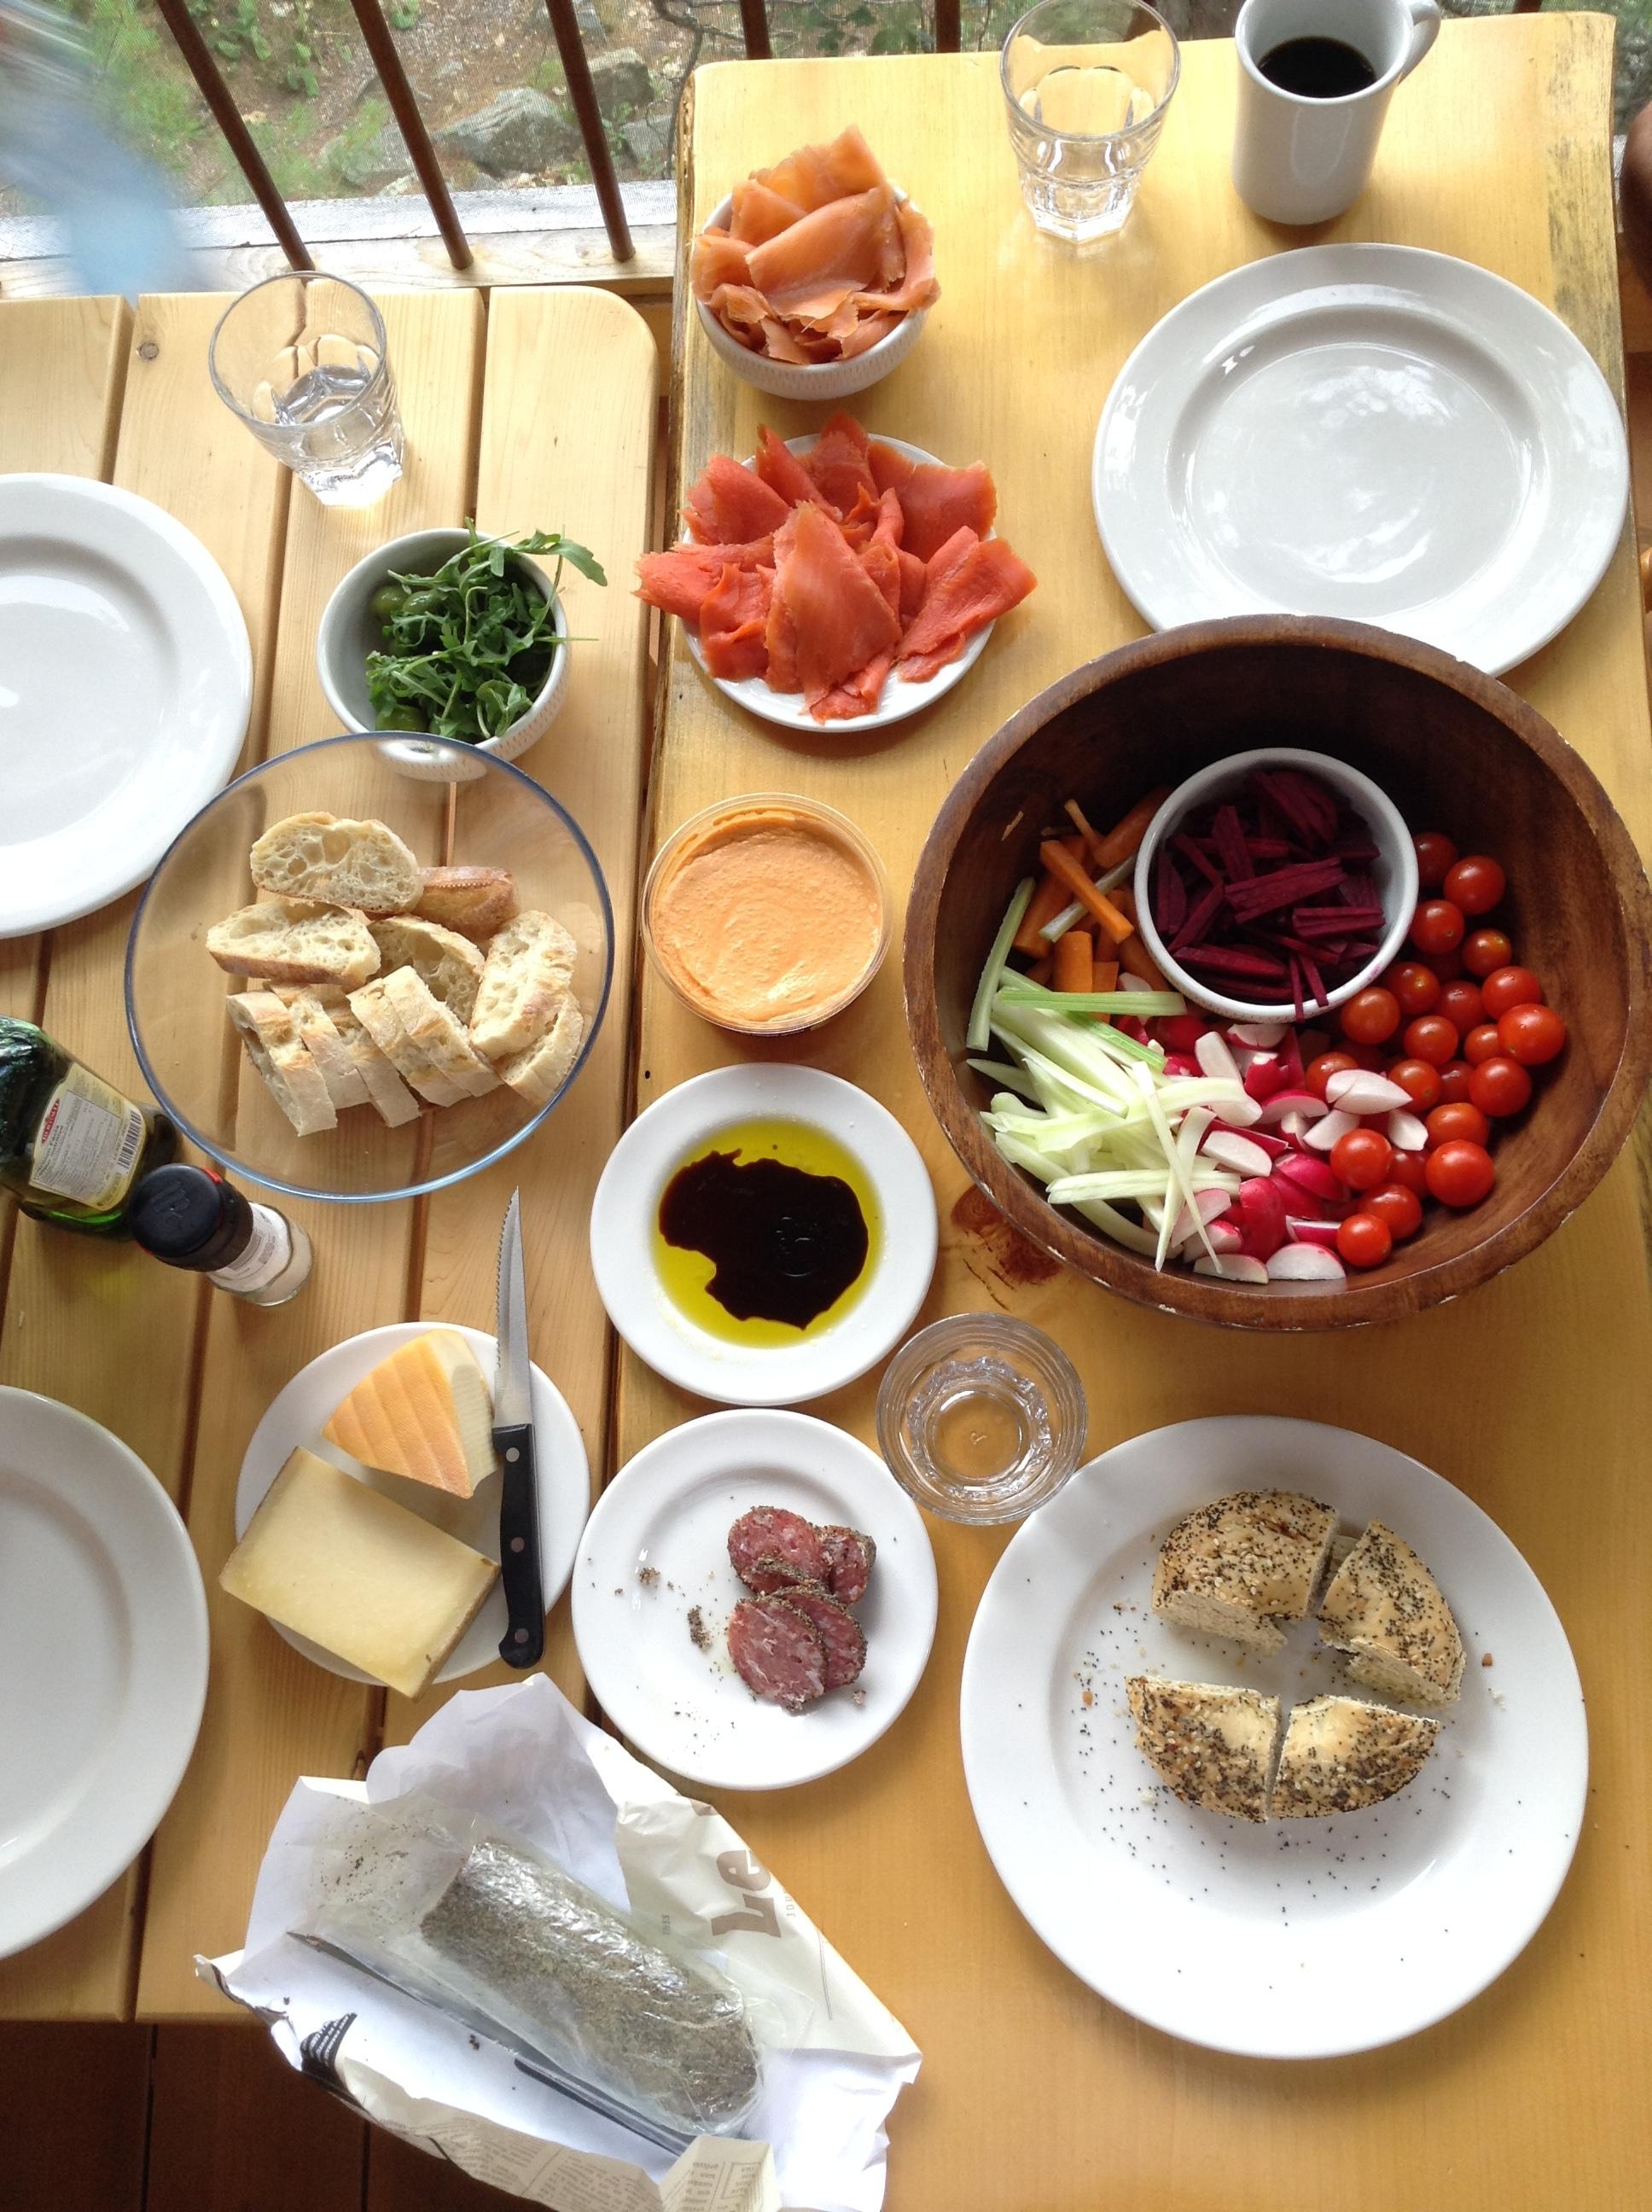 Homemade lunch